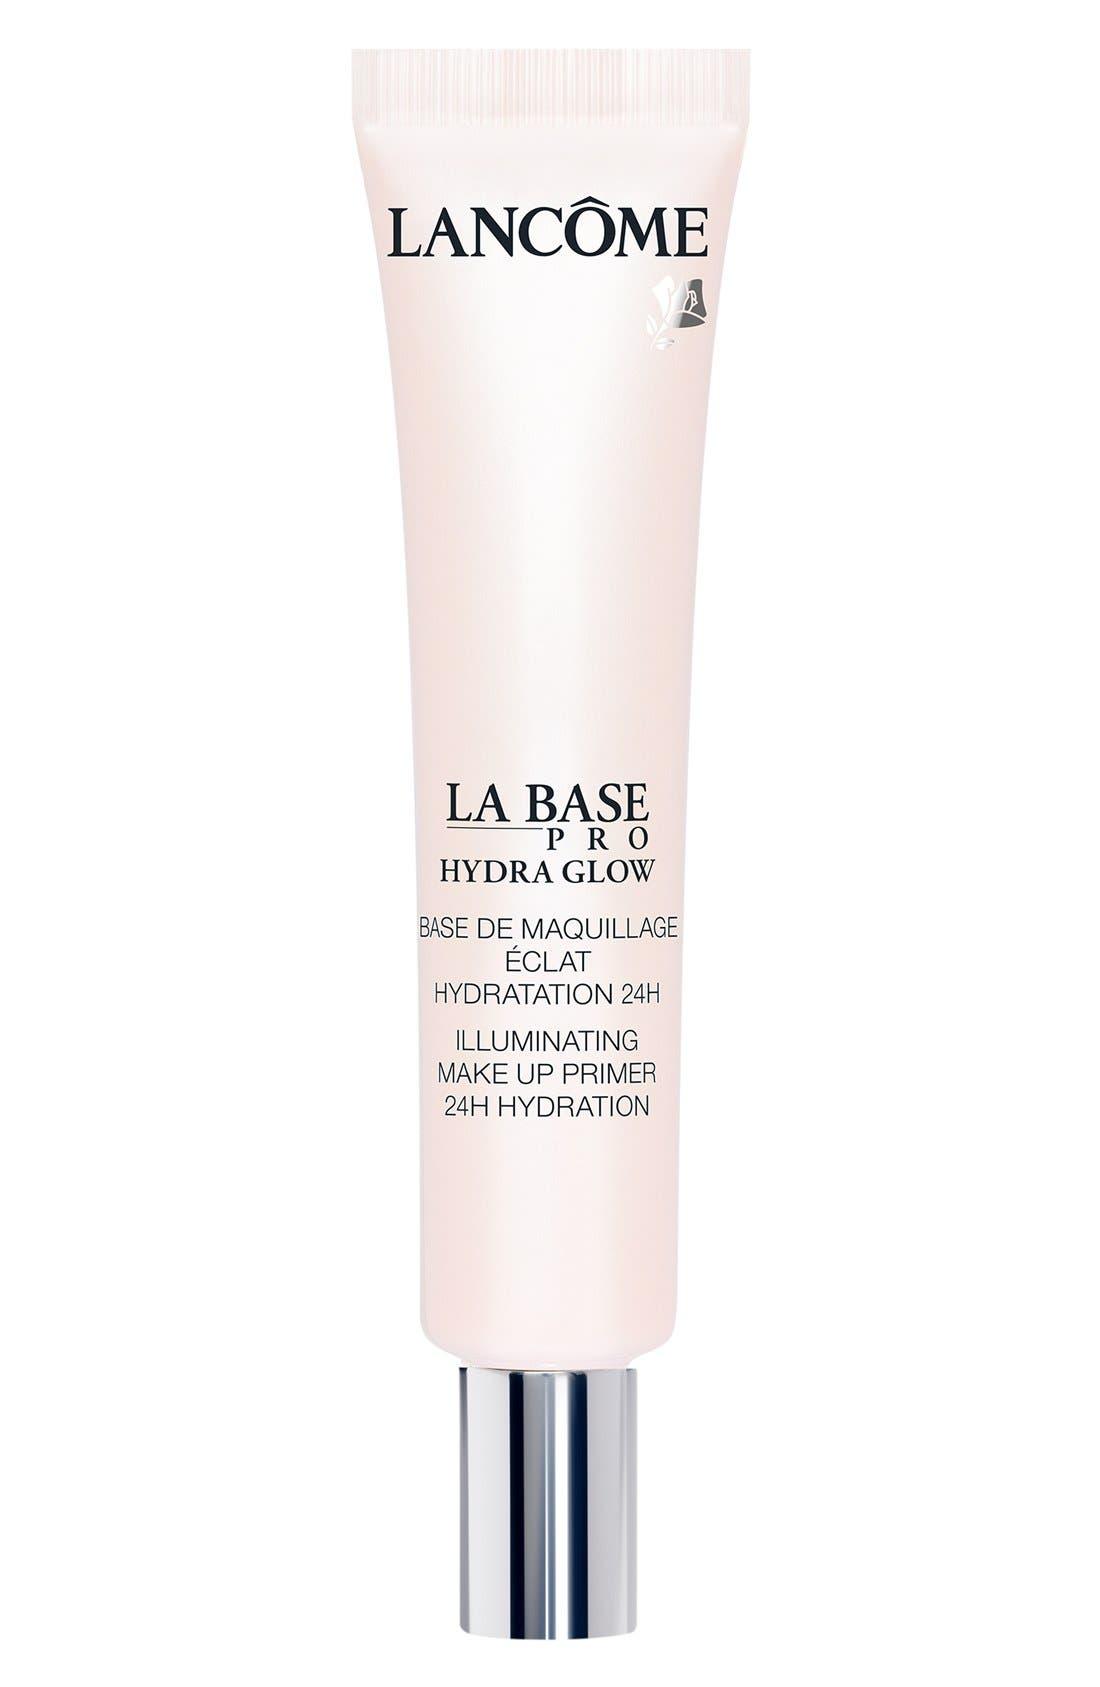 La Base Pro - Hydra Glow Illuminating Makeup Primer 24-Hour Hydration,                             Main thumbnail 1, color,                             000